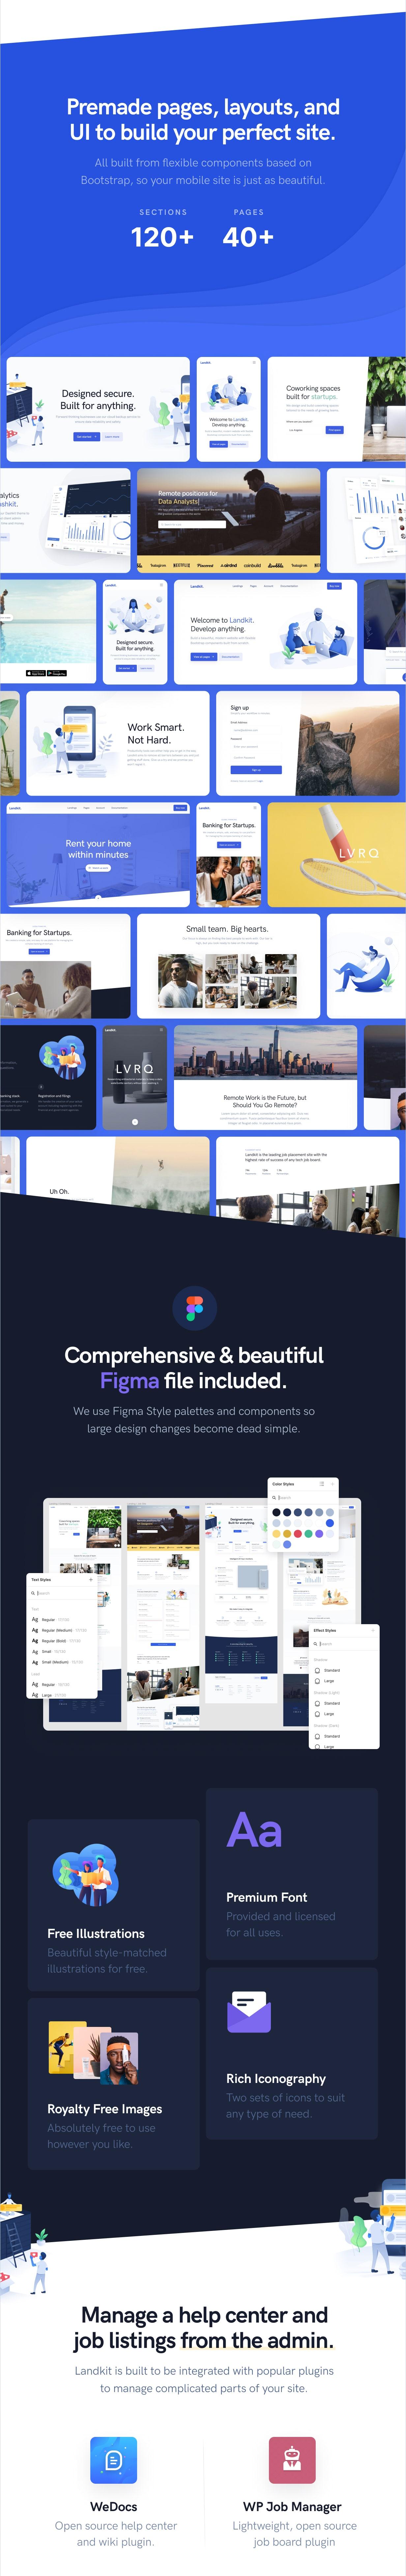 Landkit - Multipurpose Business WordPress Theme - 2